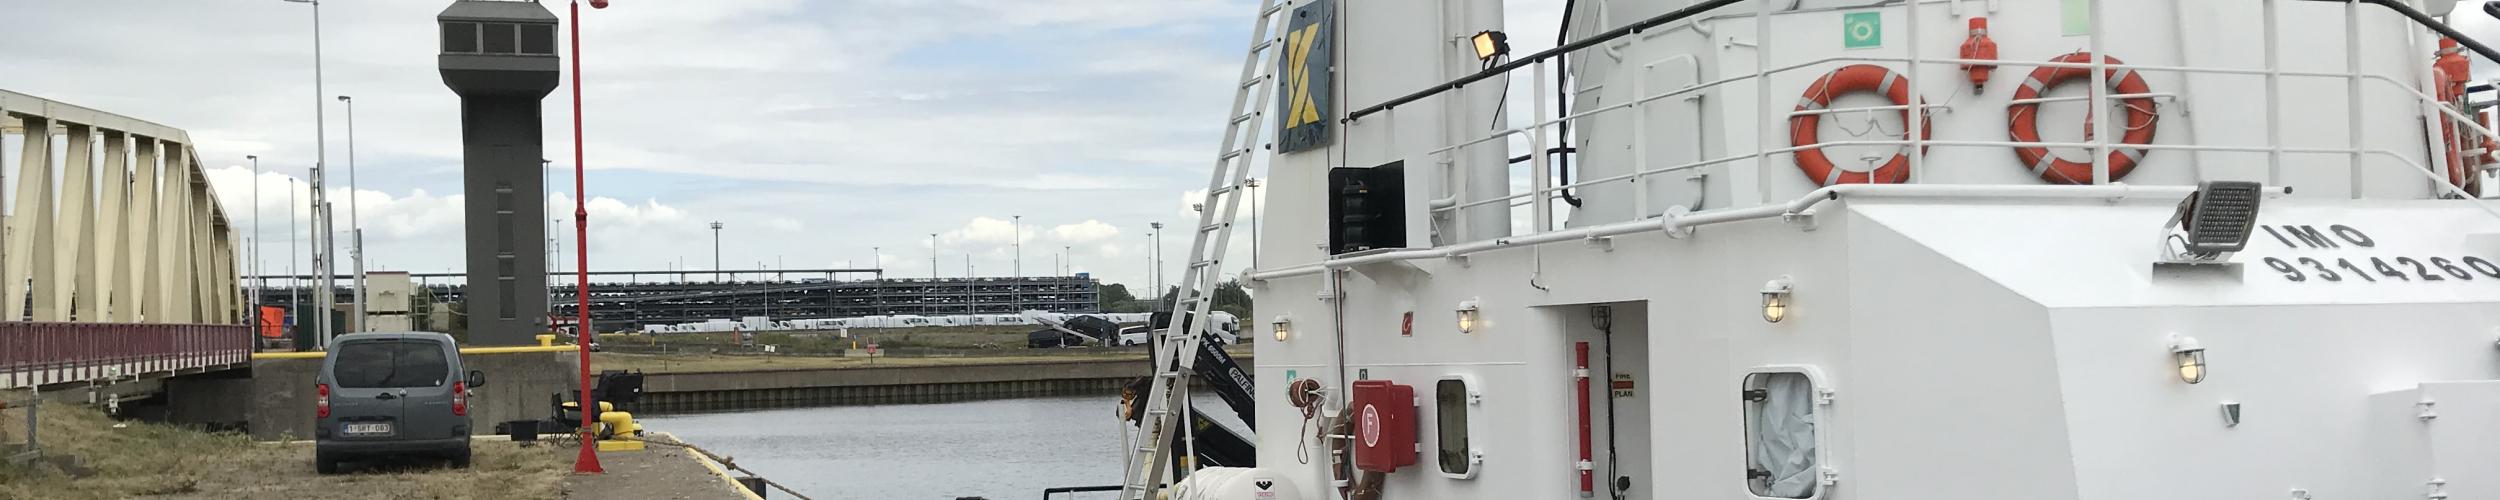 Sea Tug inspection in the Port of Zeebrugge for Kotug Smit